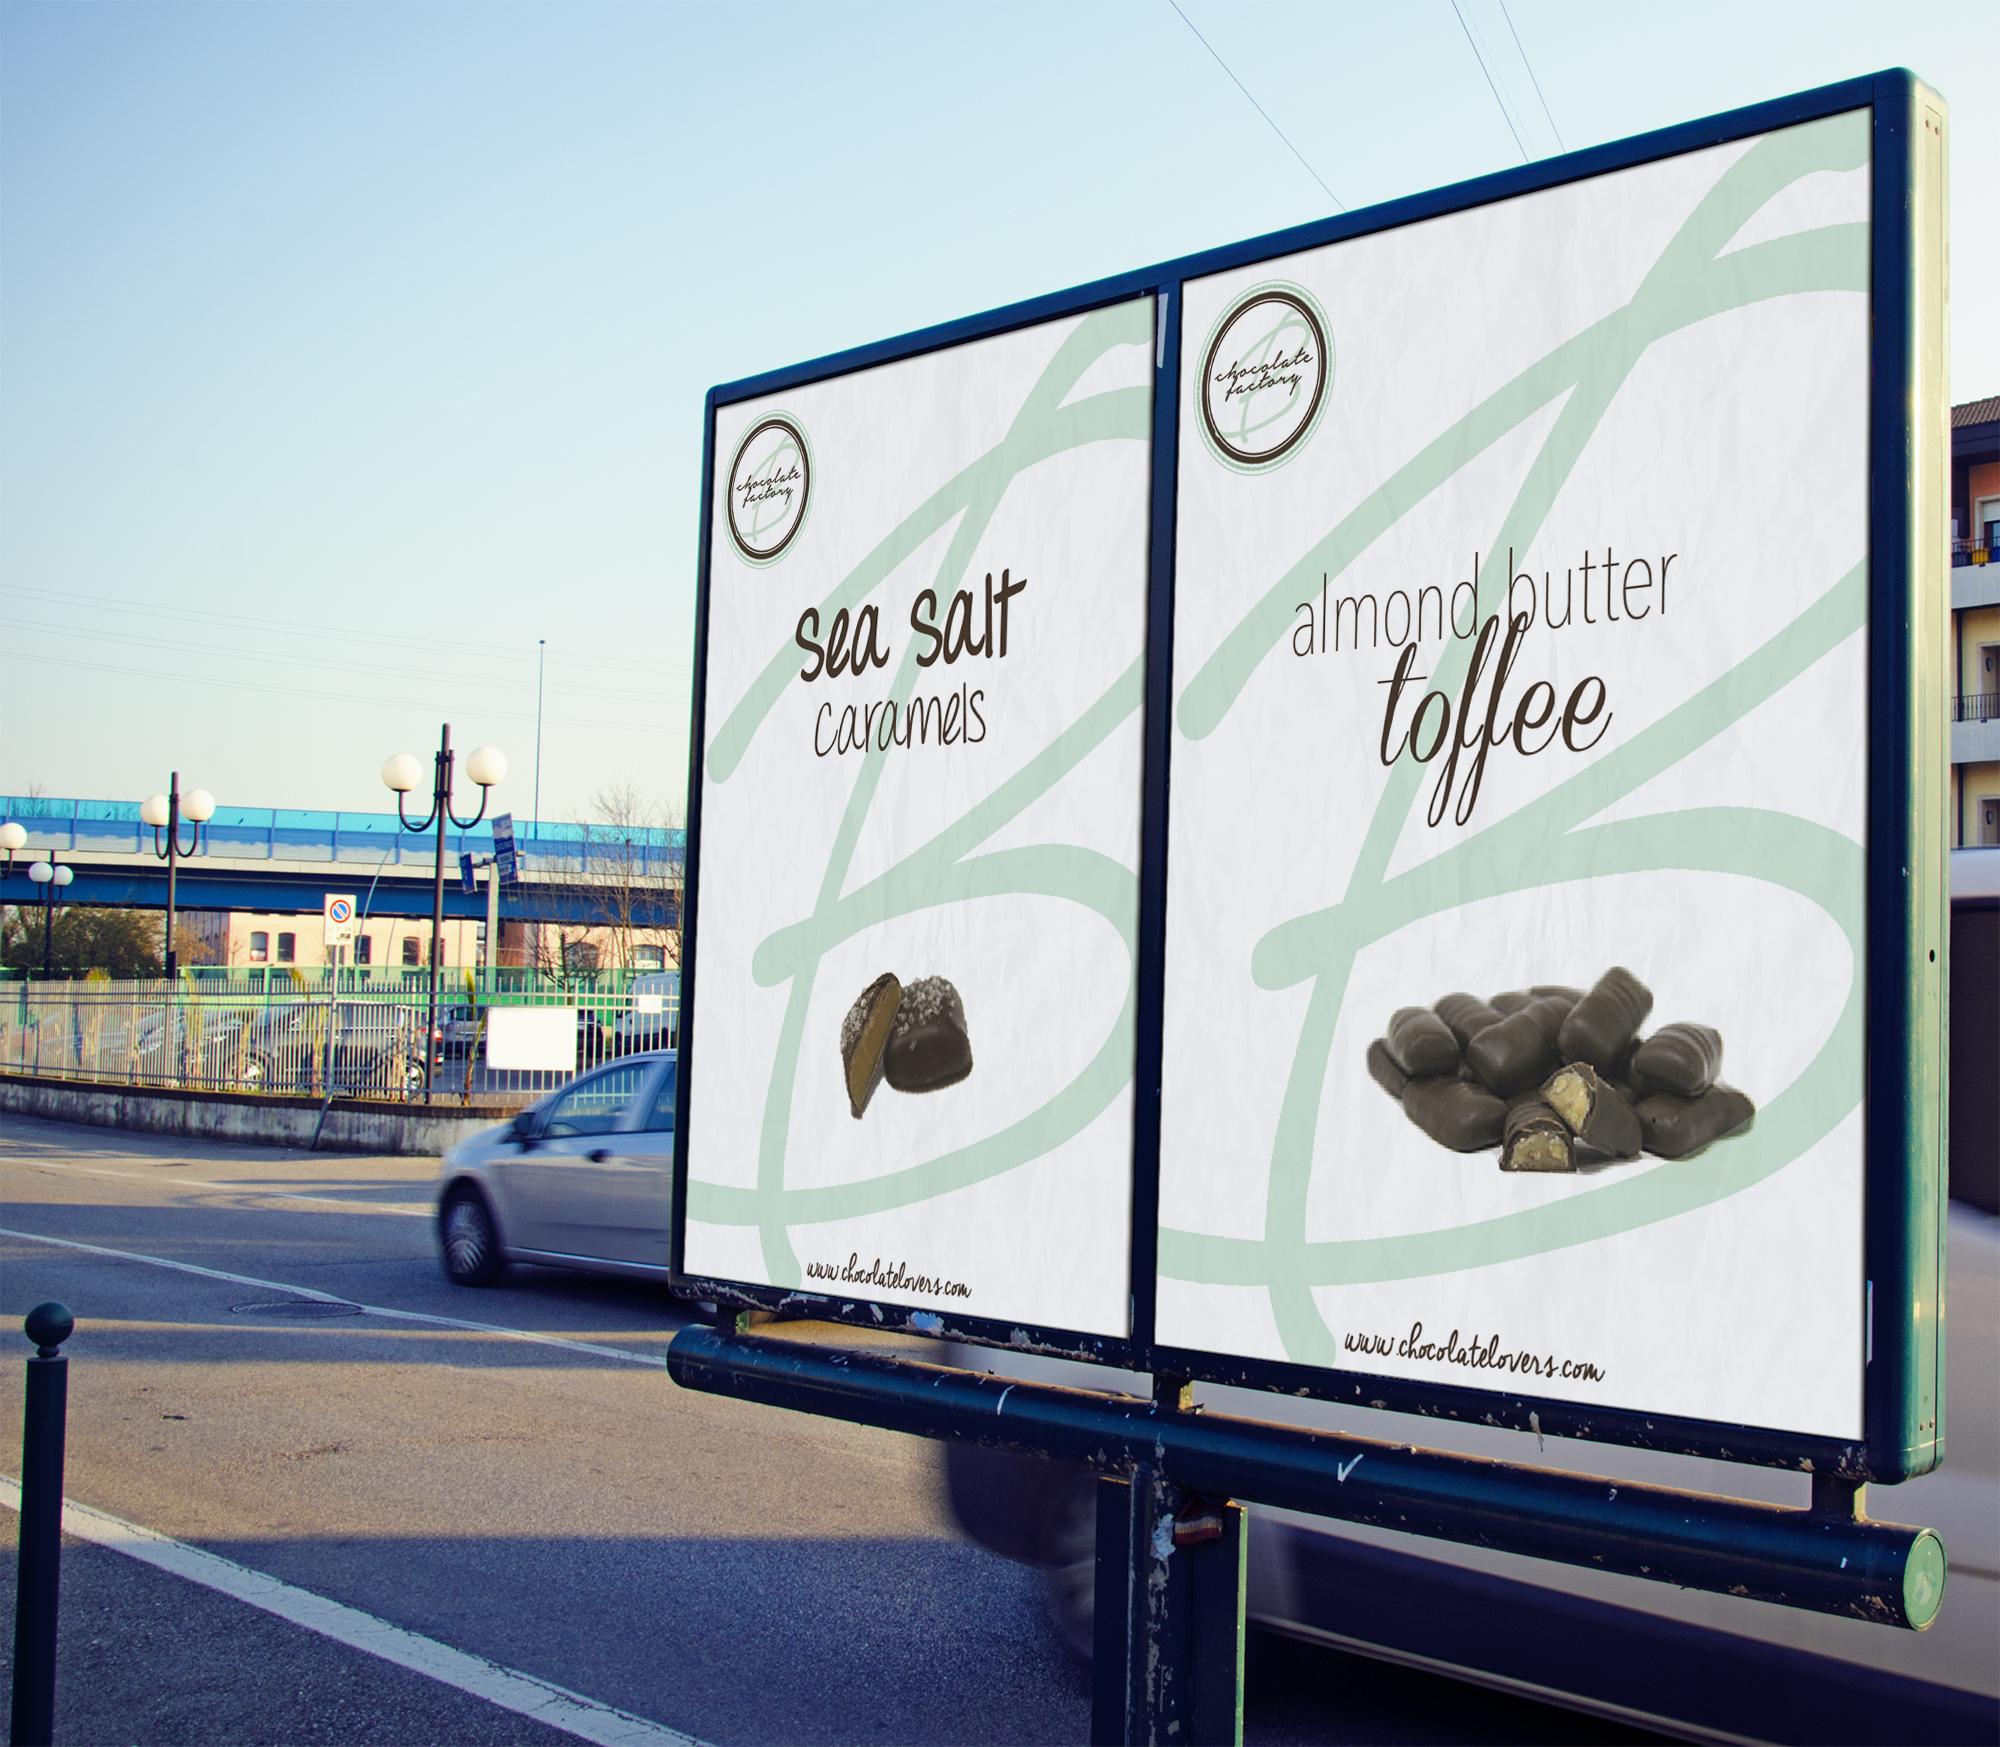 Bradley's Chocolate FactoryOutdoor Advertising - created in Photoshop  - class project